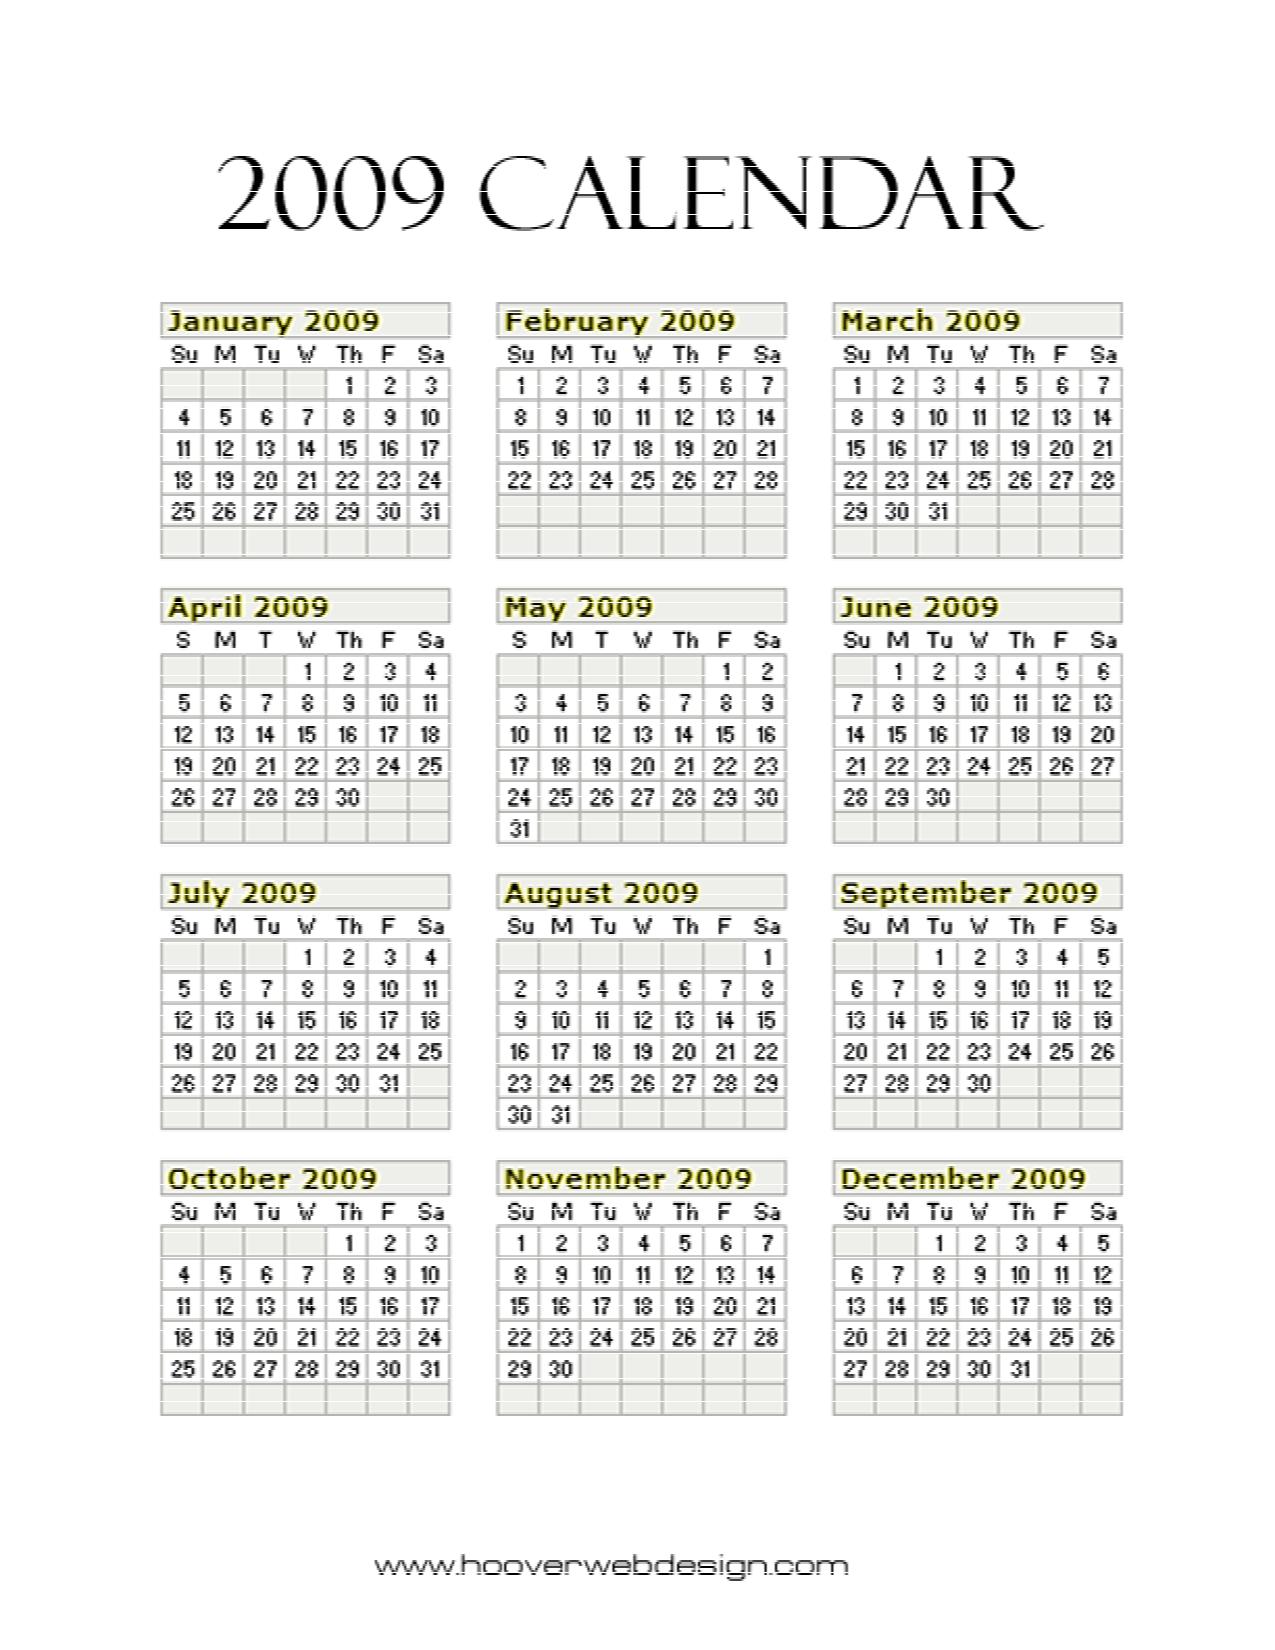 Best images of free printable year calendar 2009 2009 calendar